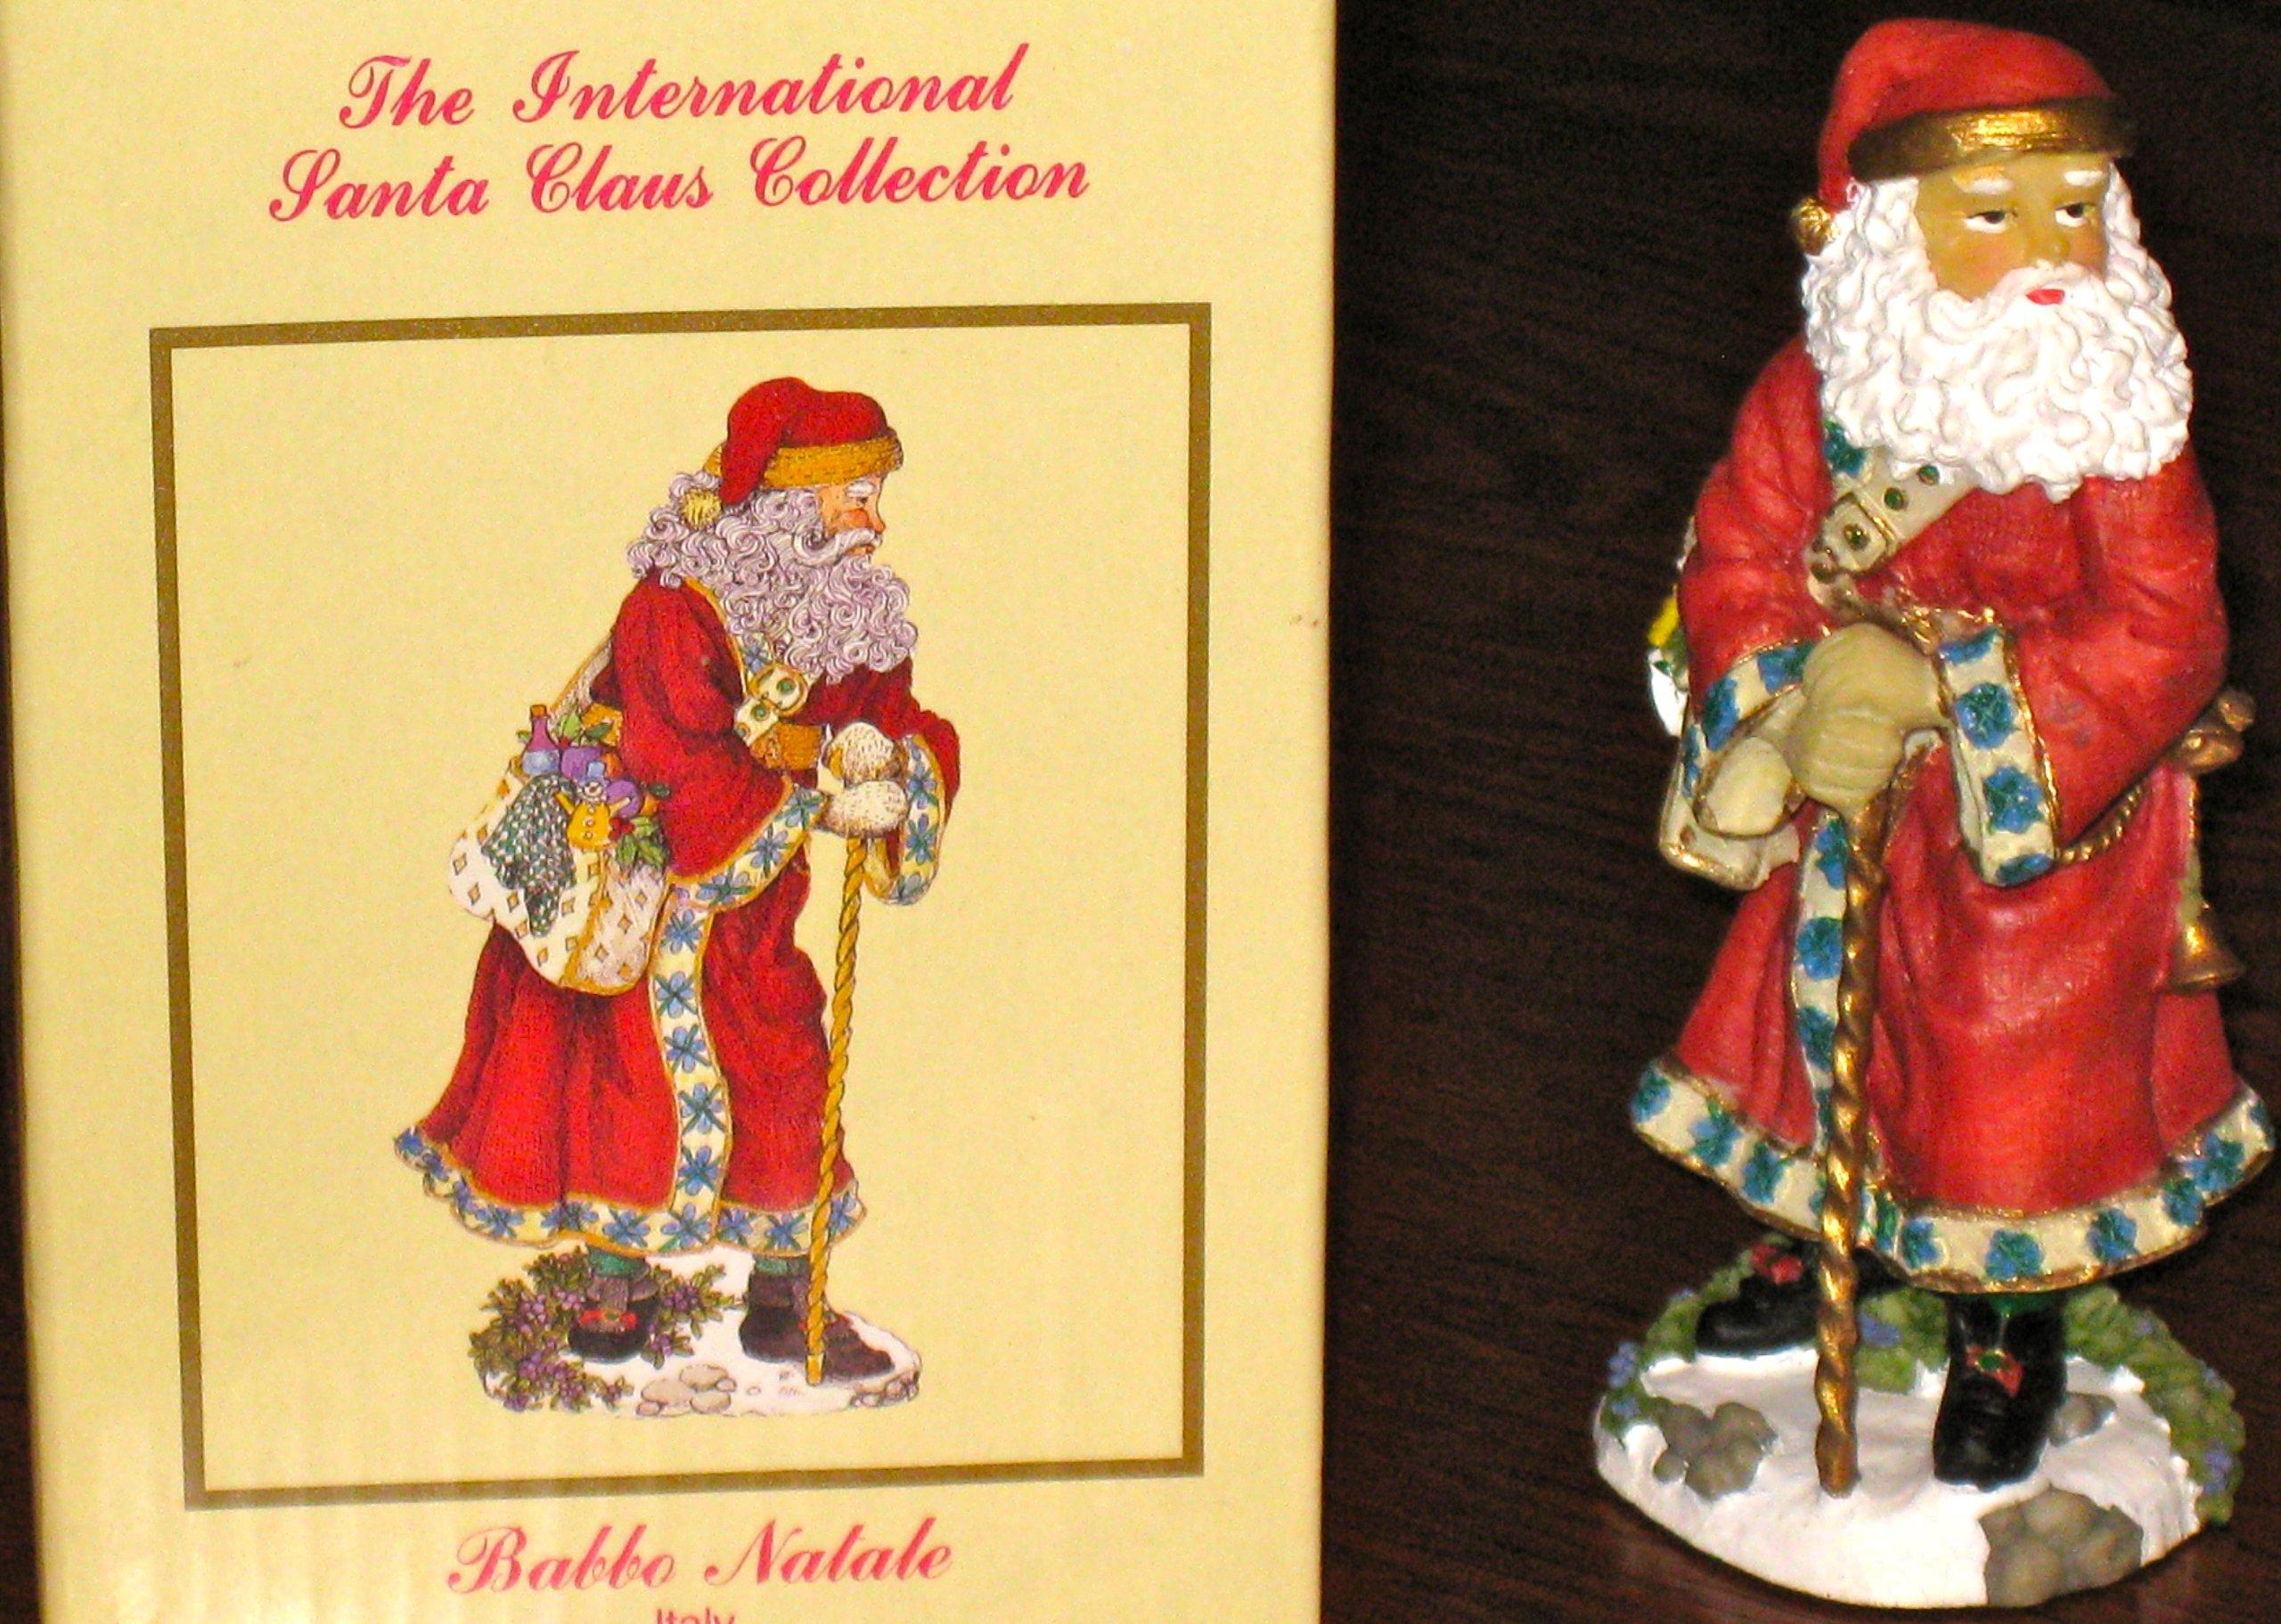 Babbo Natale Italy.Babbo Natale Babbo Natale Italy The International Santa Claus